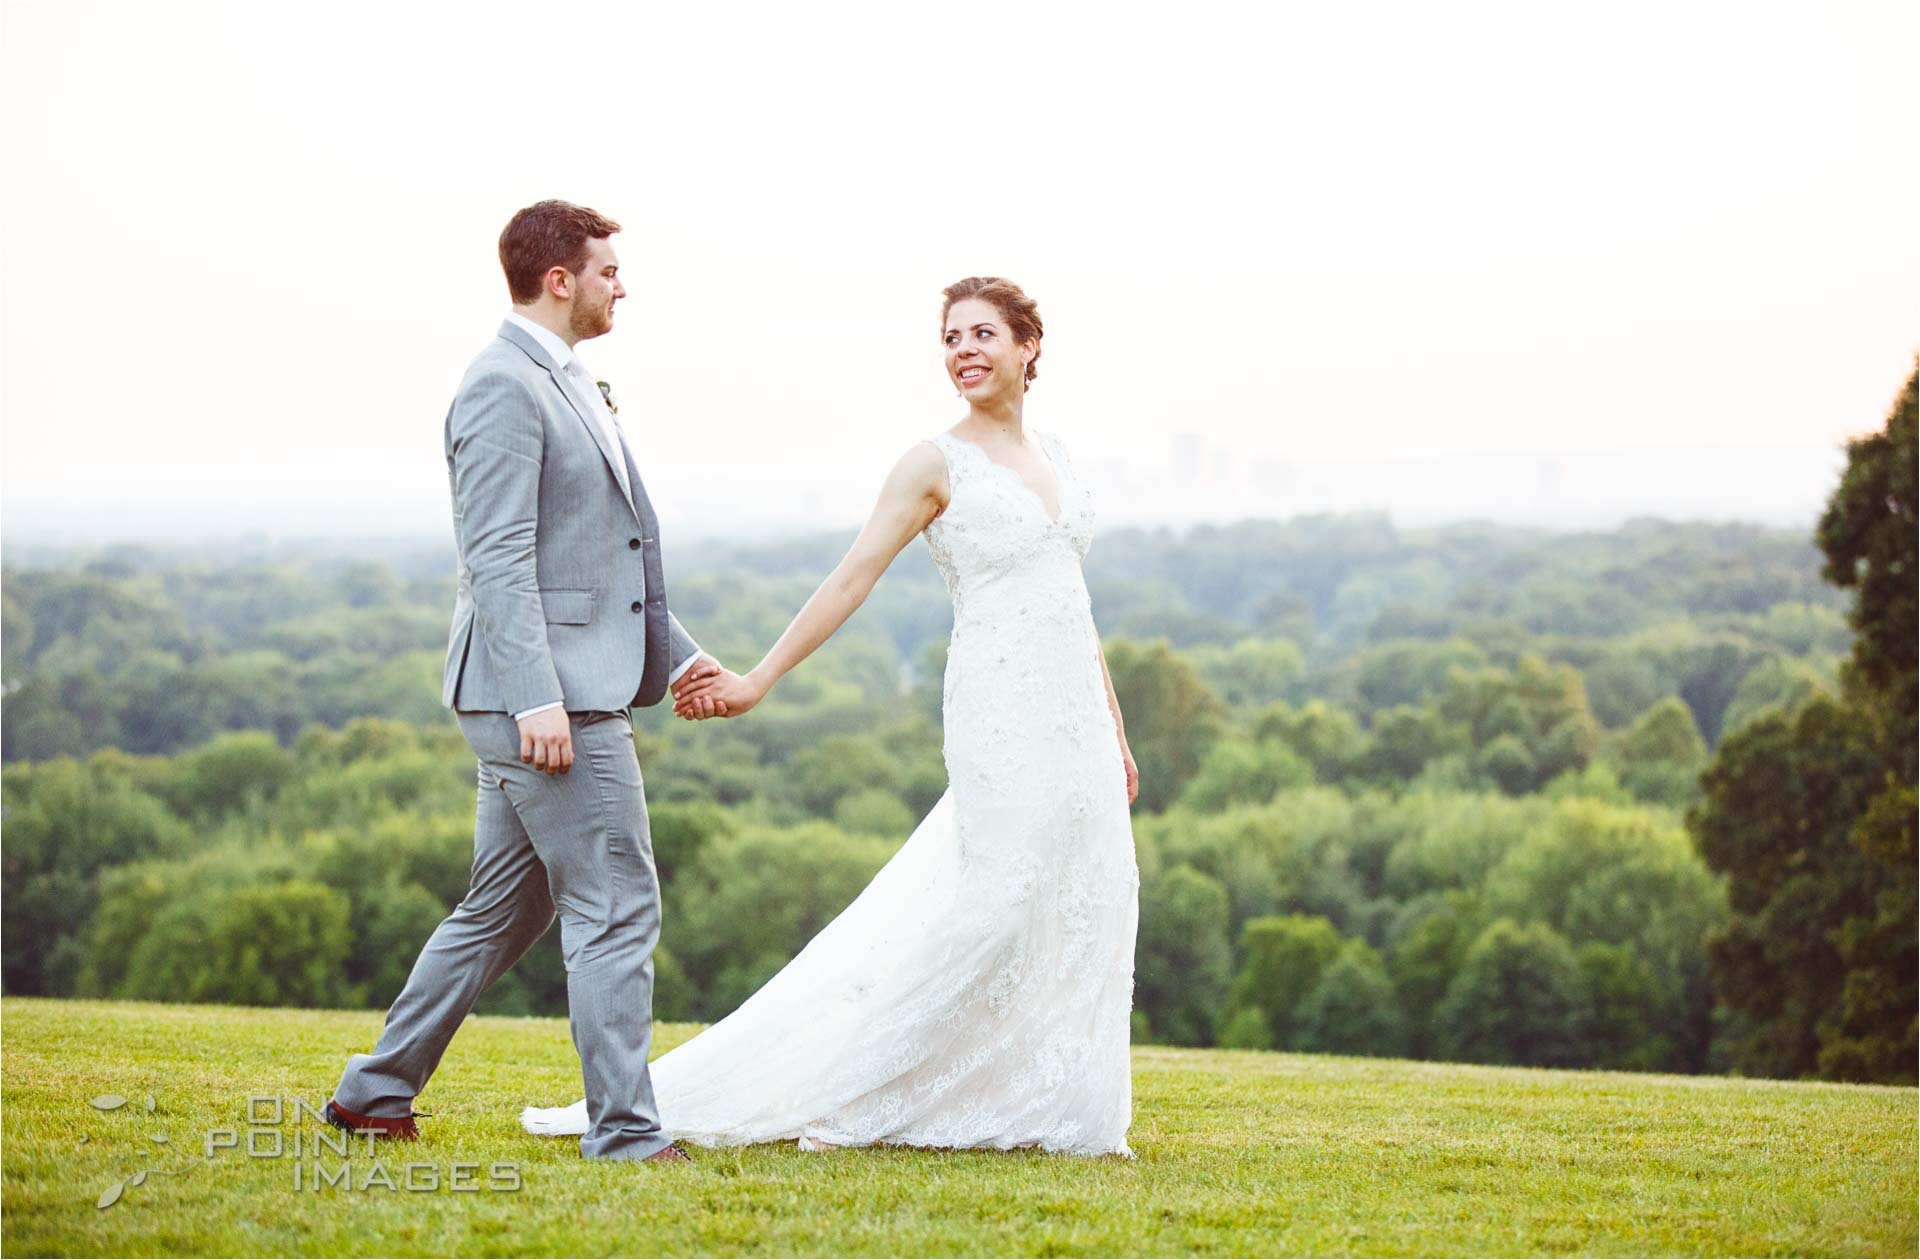 wickham-park-wedding-photographer-ct-36.jpg